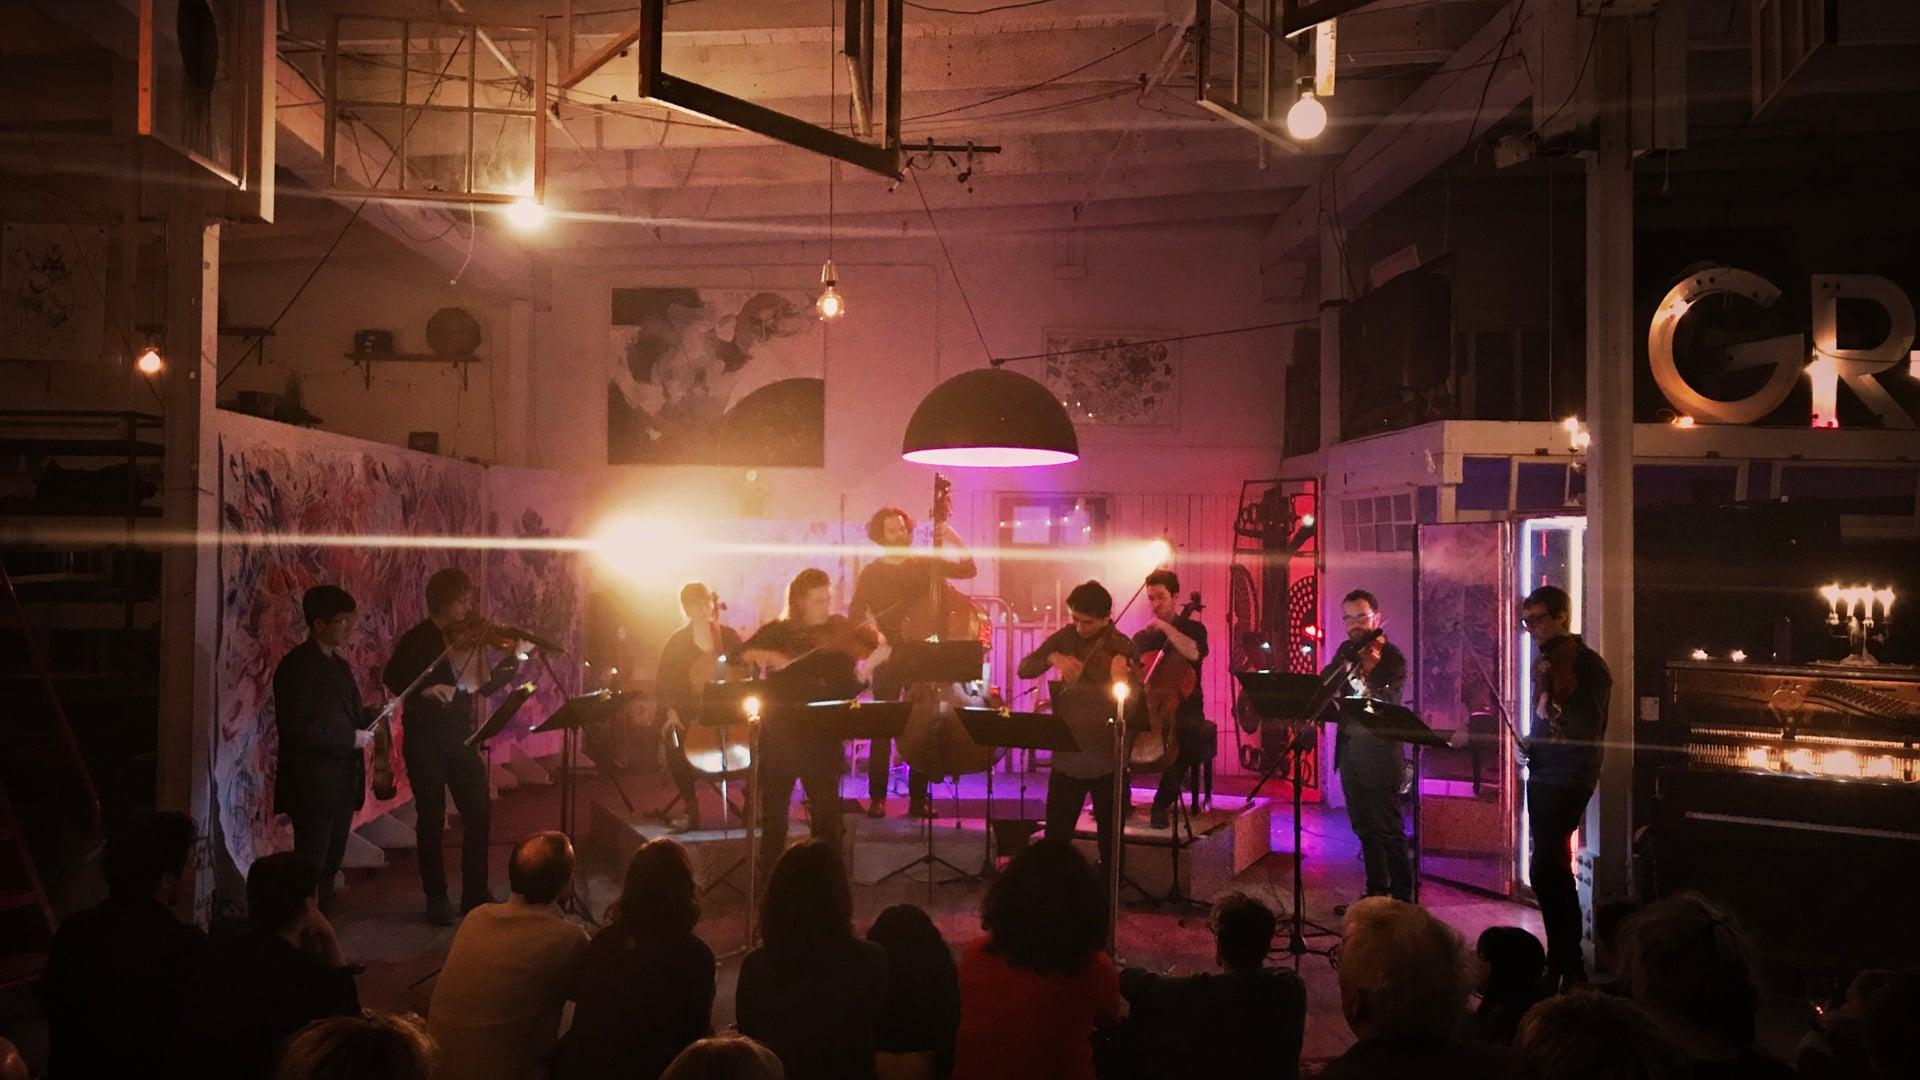 collectif9 - Night of the Flying Horses - 07 - Hora Din Caval (Taraf de Haïdouks)